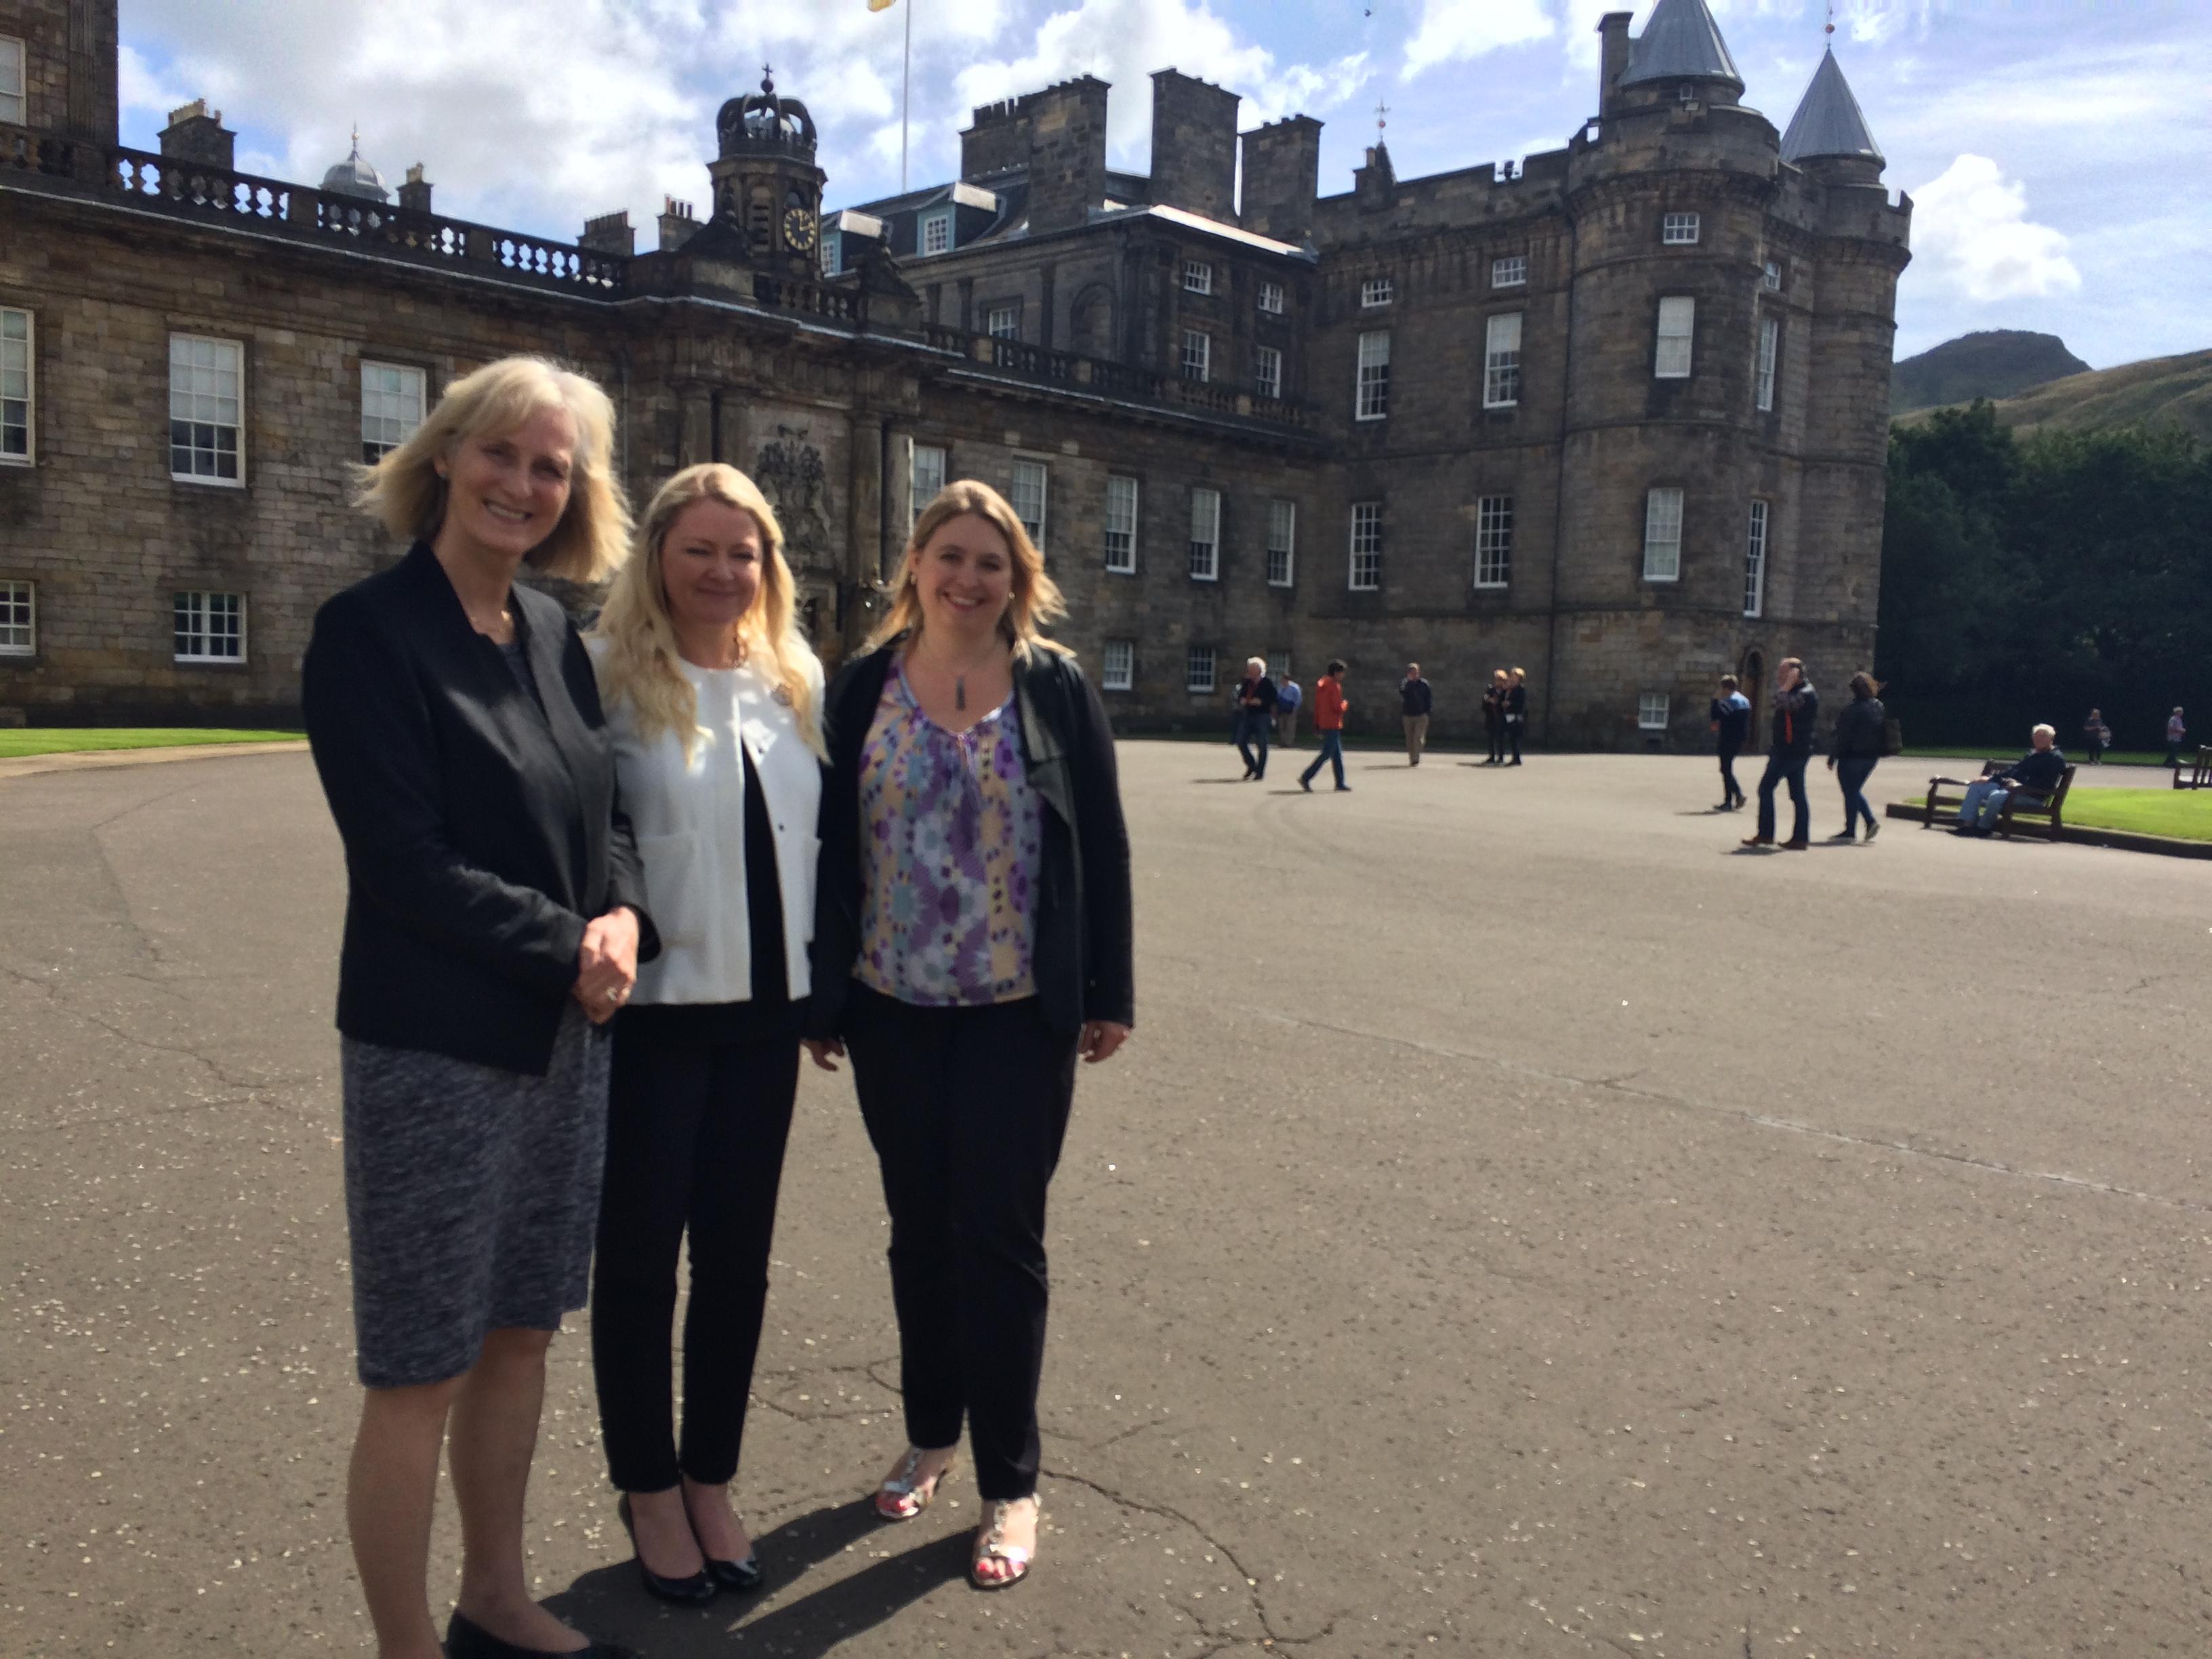 Culture Secretary Karen Bradley at Holyrood Palace